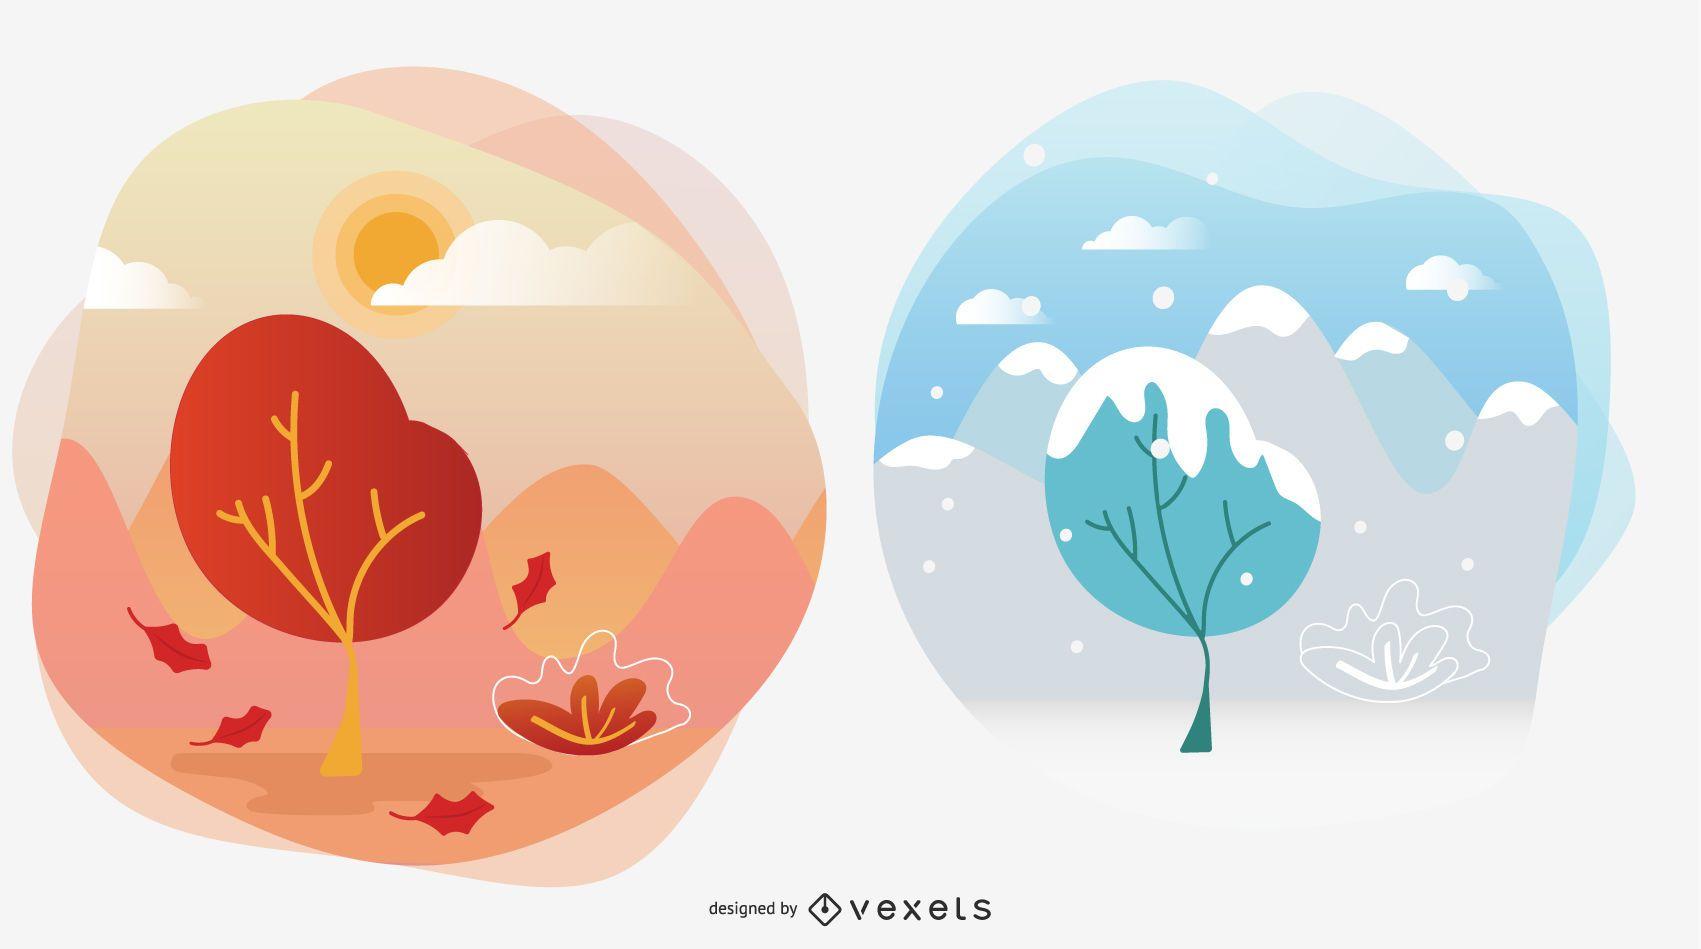 Fall and Winter Season Vector Illustrations